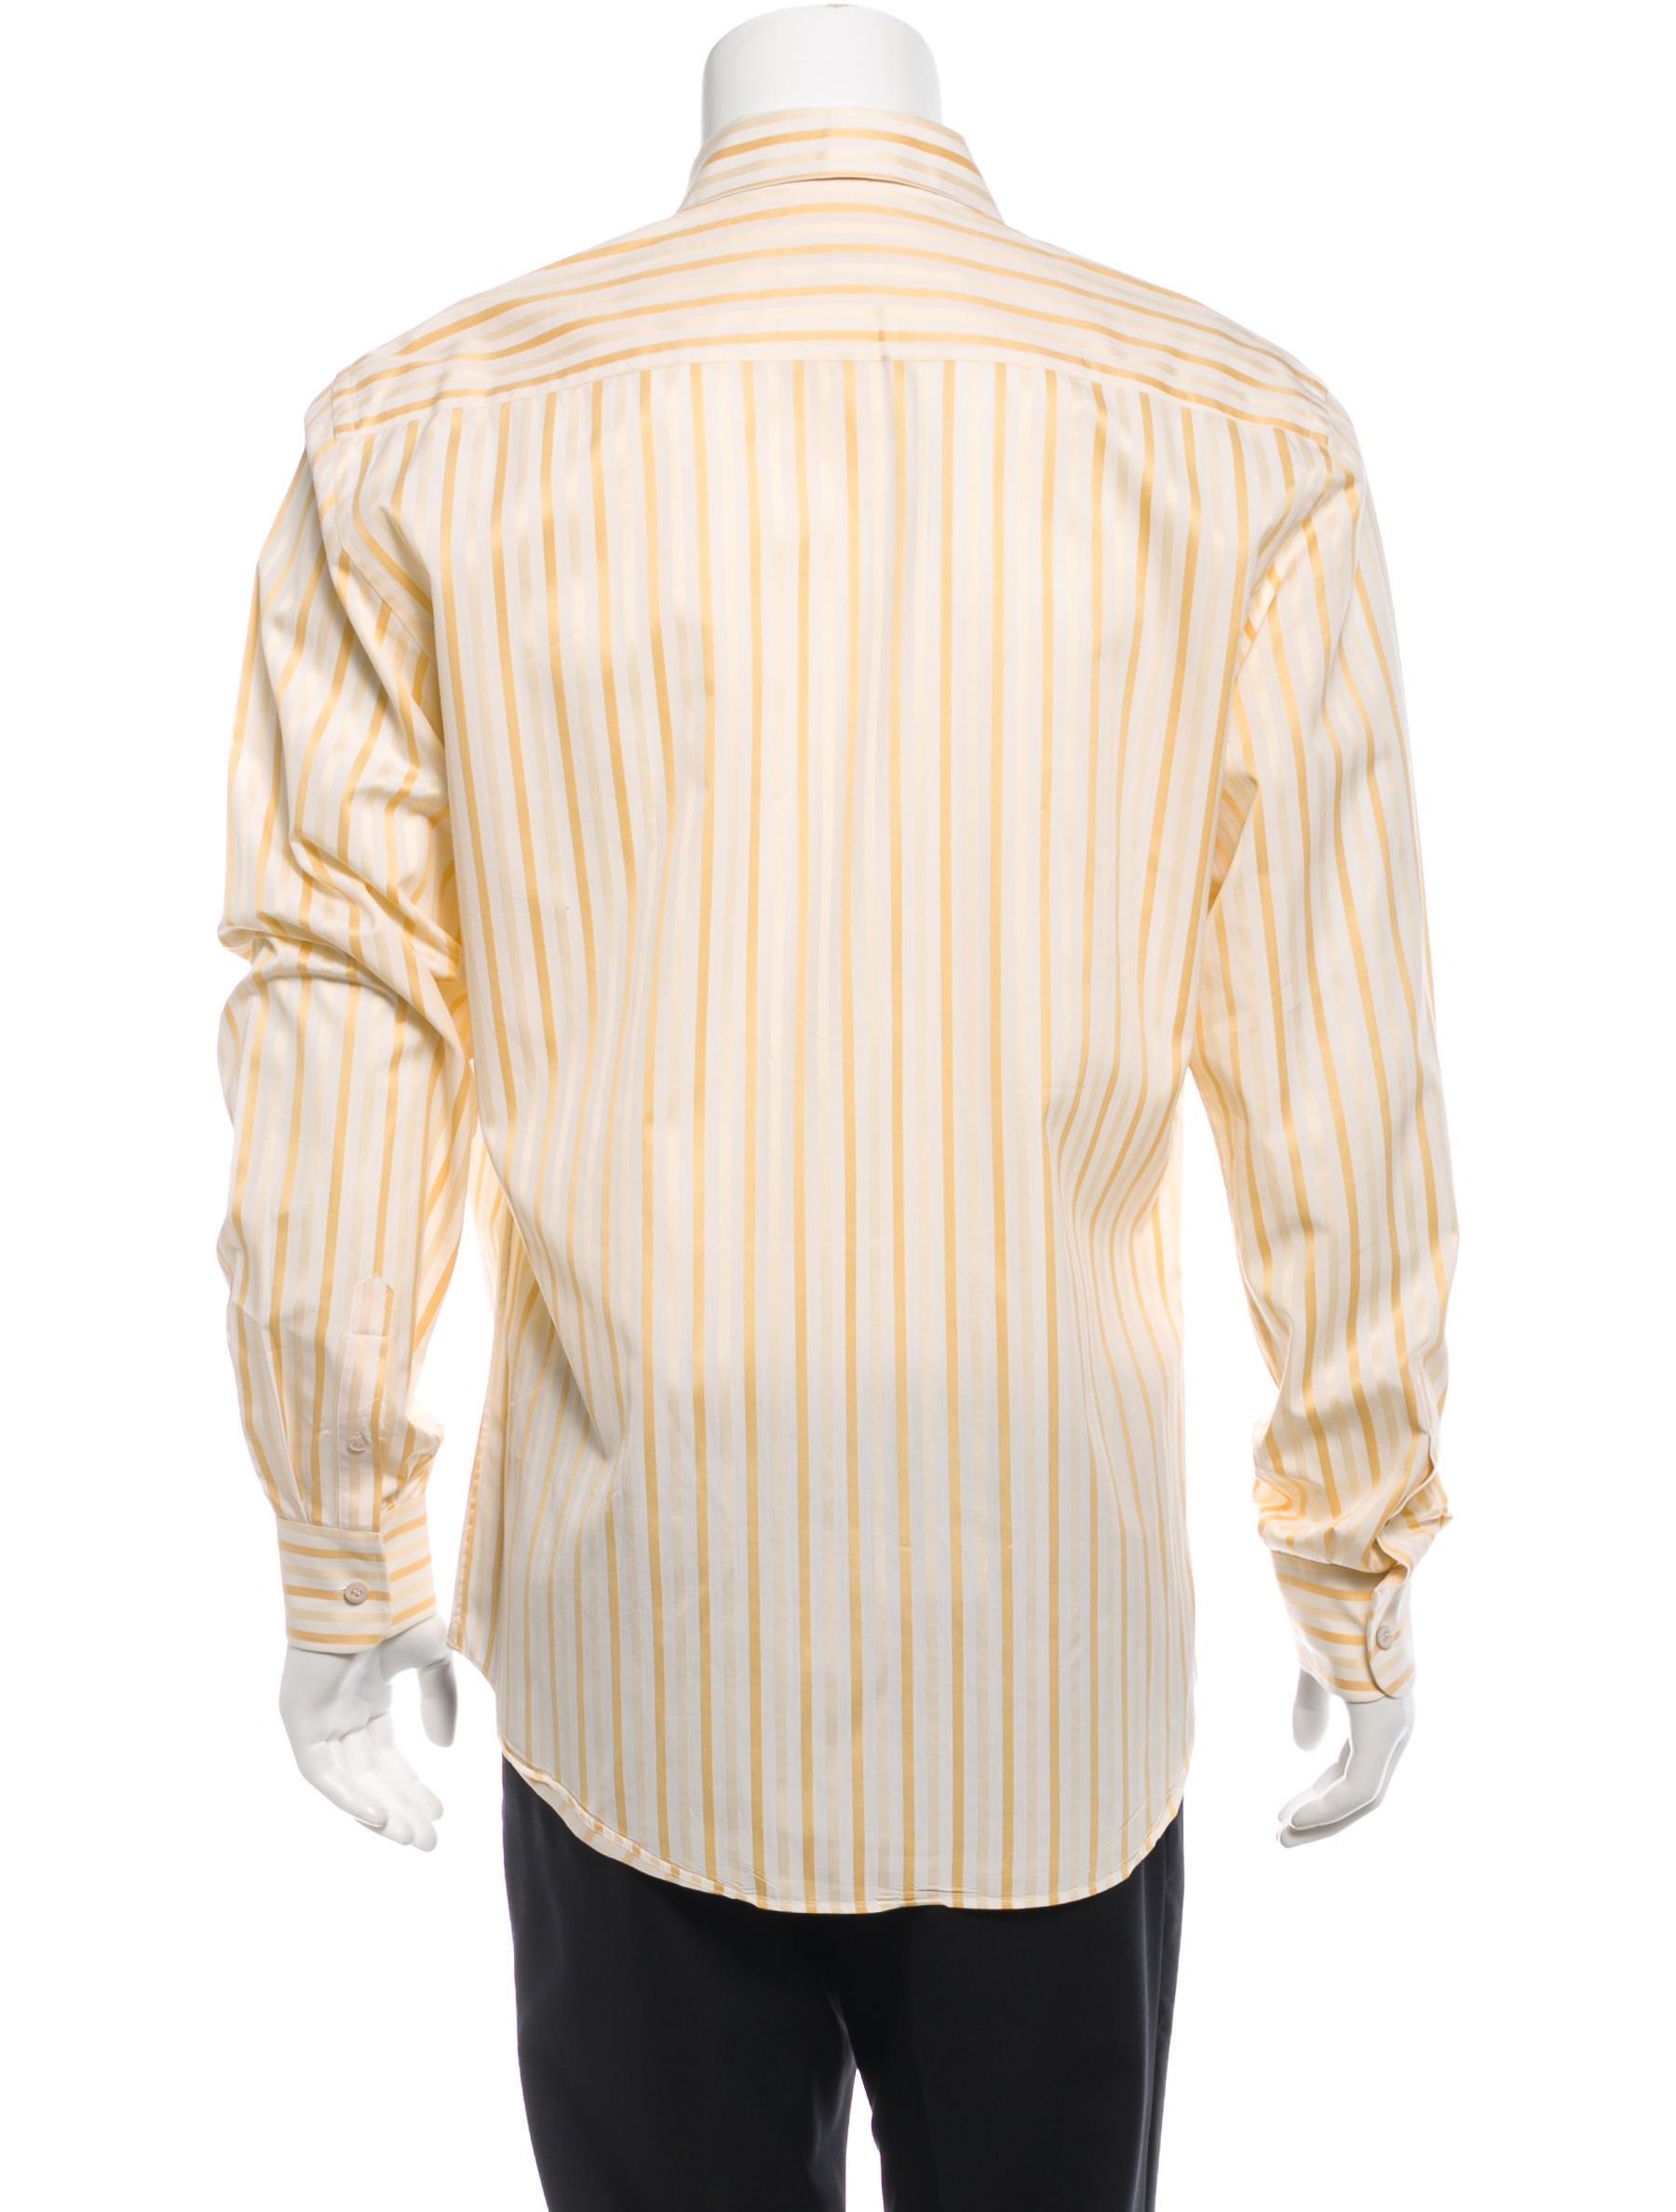 Prada Long Sleeve Button Up Shirt Clothing Pra85319